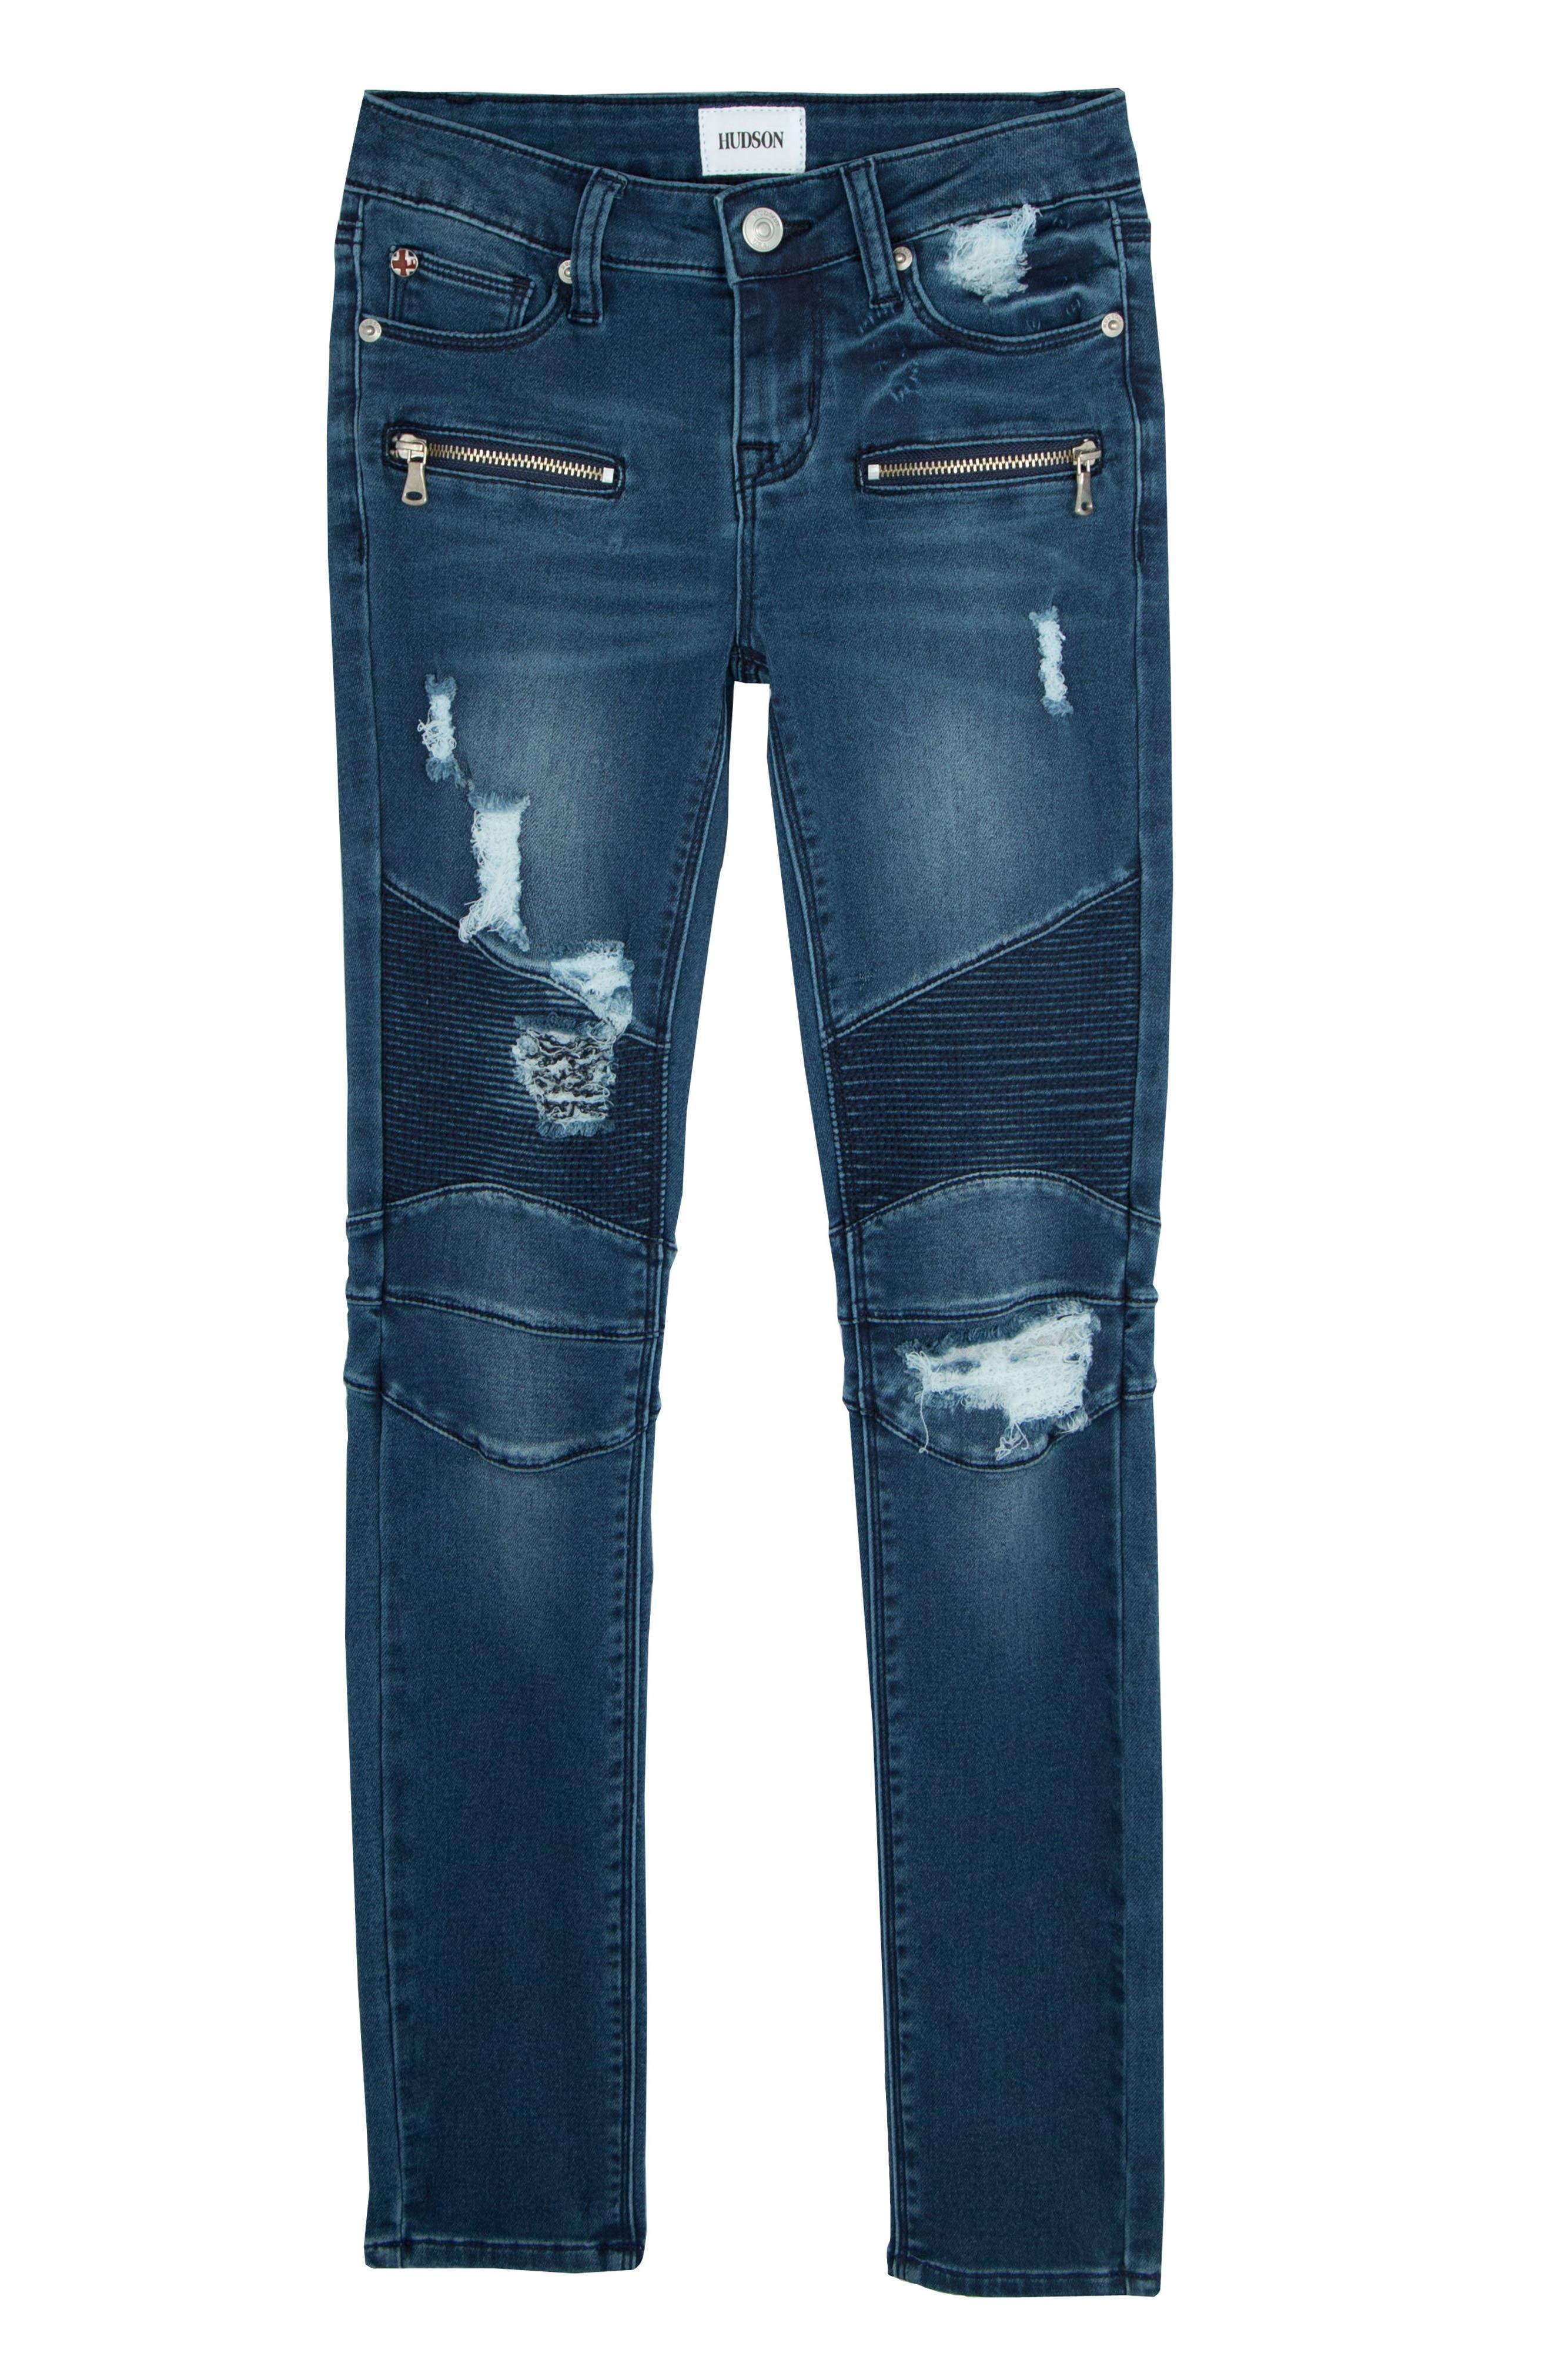 London Distressed Moto Skinny Jeans,                         Main,                         color, Shaken Blue